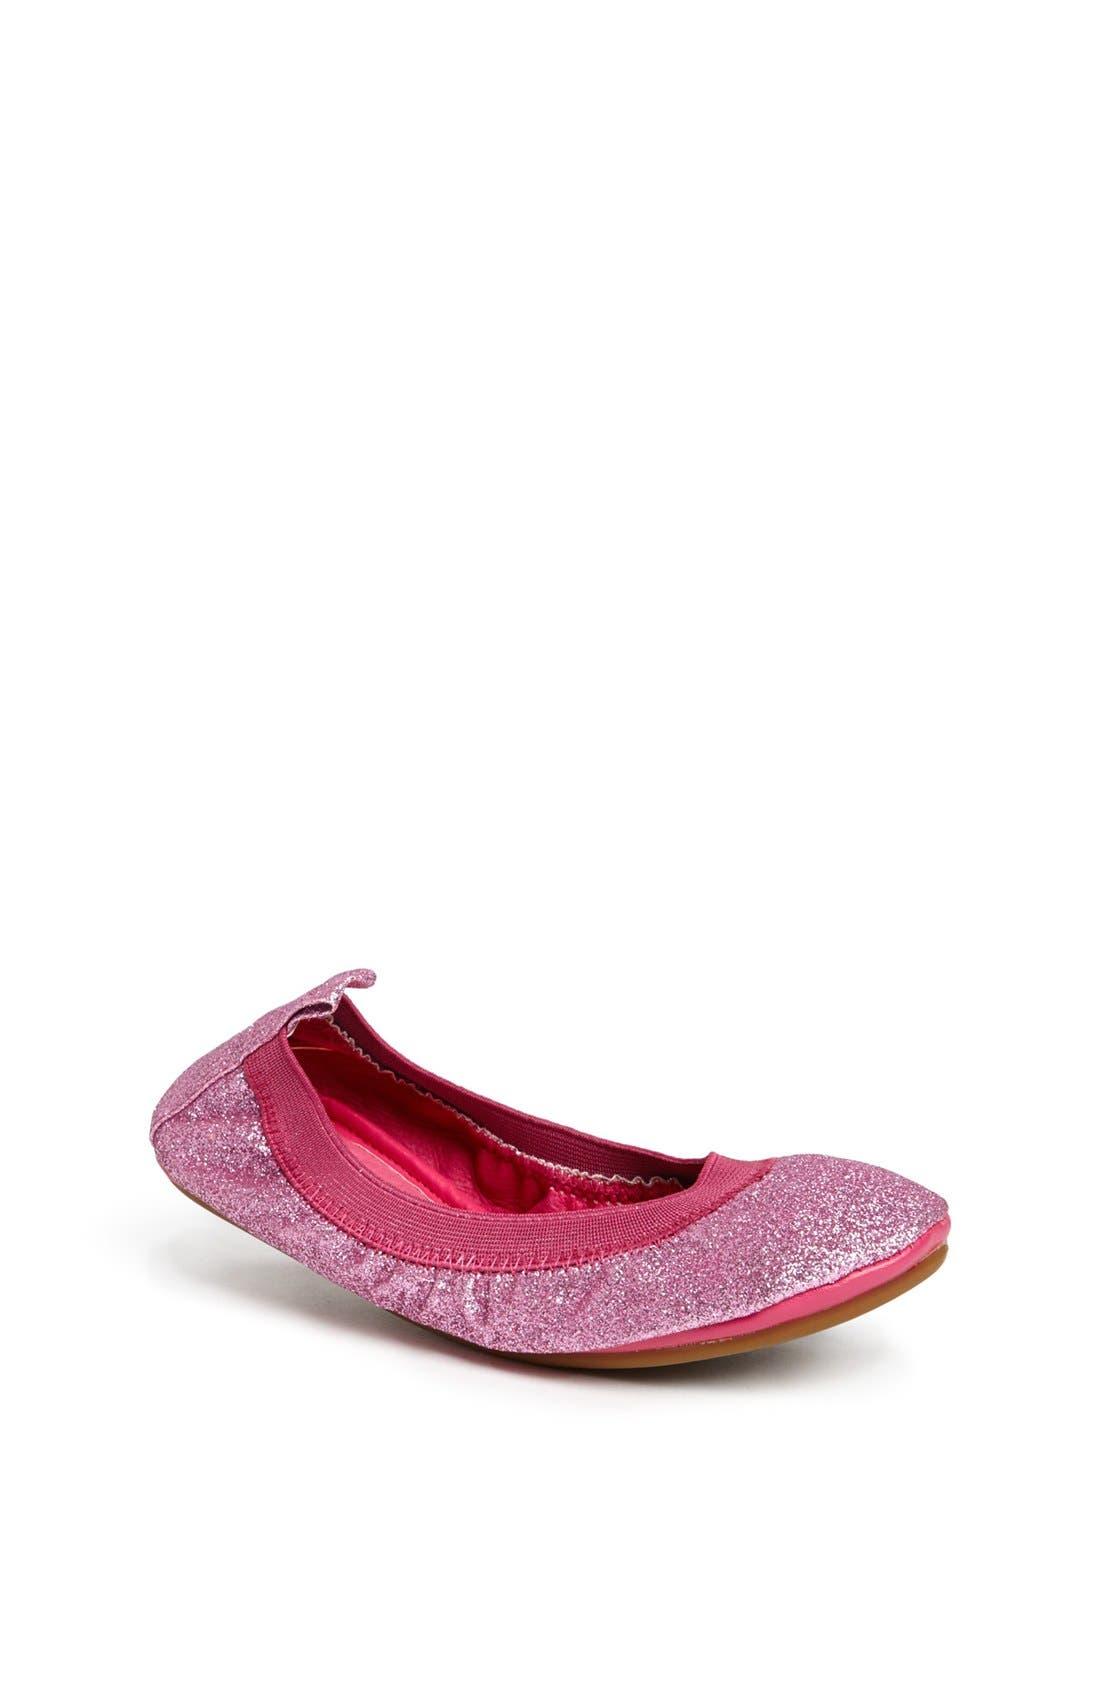 Alternate Image 1 Selected - Yosi Samra Glitter Foldable Ballet Flat (Toddler, Little Kid & Big Kid)